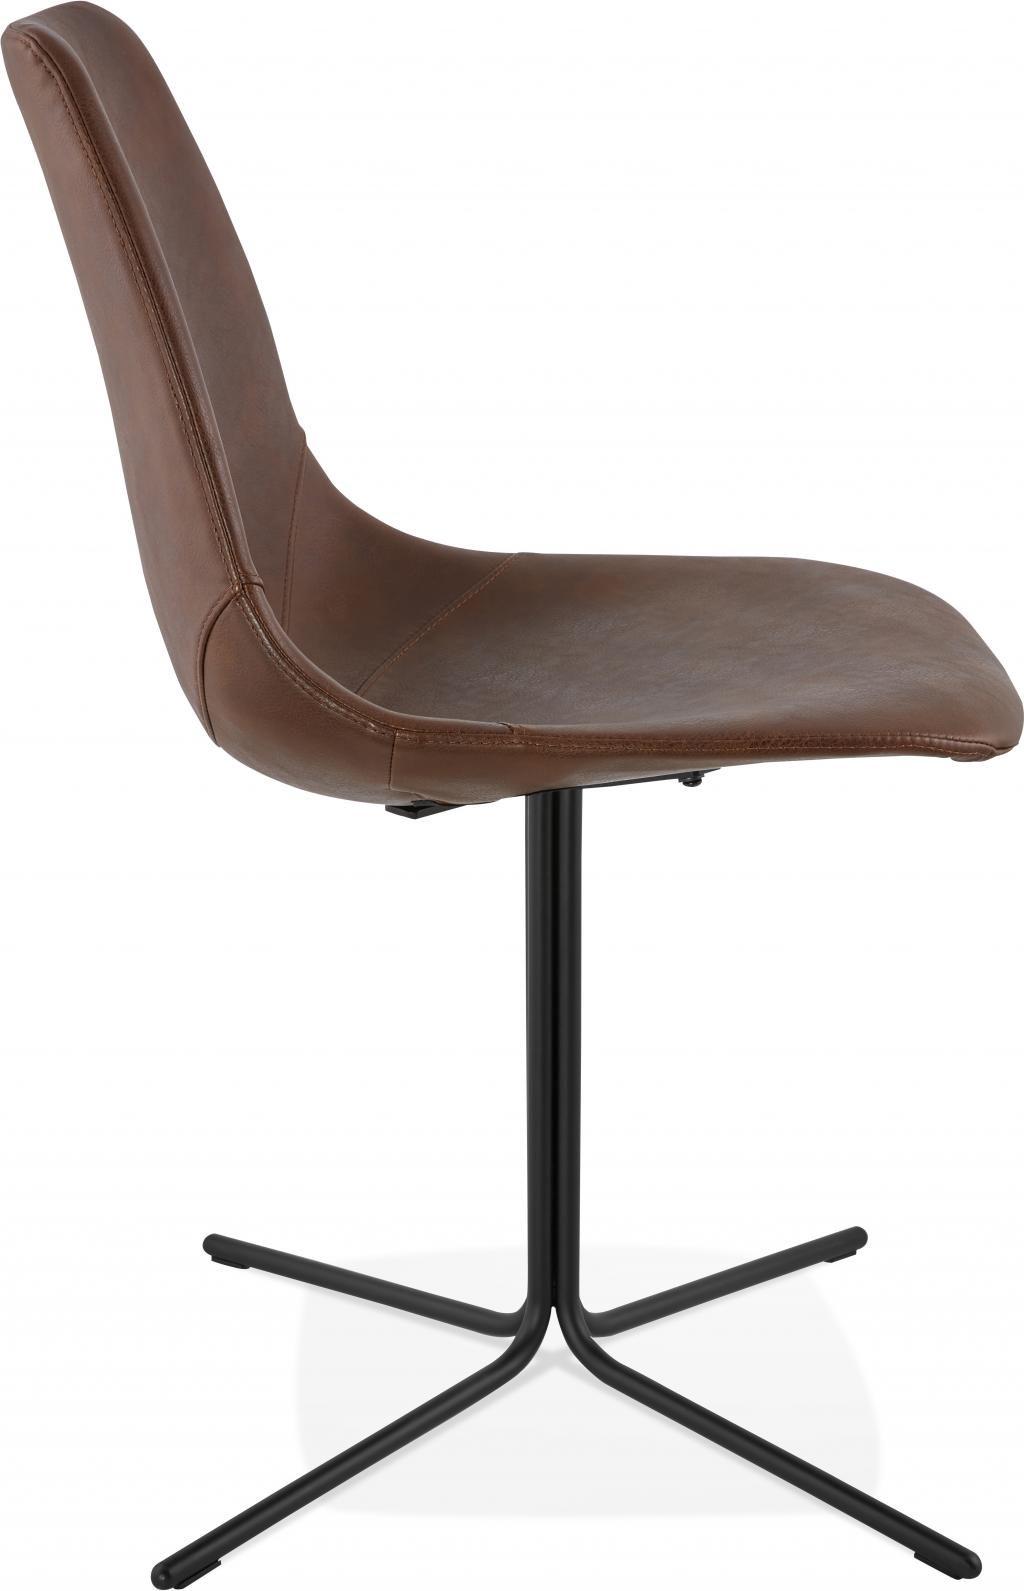 stuhl bedford braun schwarz leder metall kokoon design kaufen. Black Bedroom Furniture Sets. Home Design Ideas